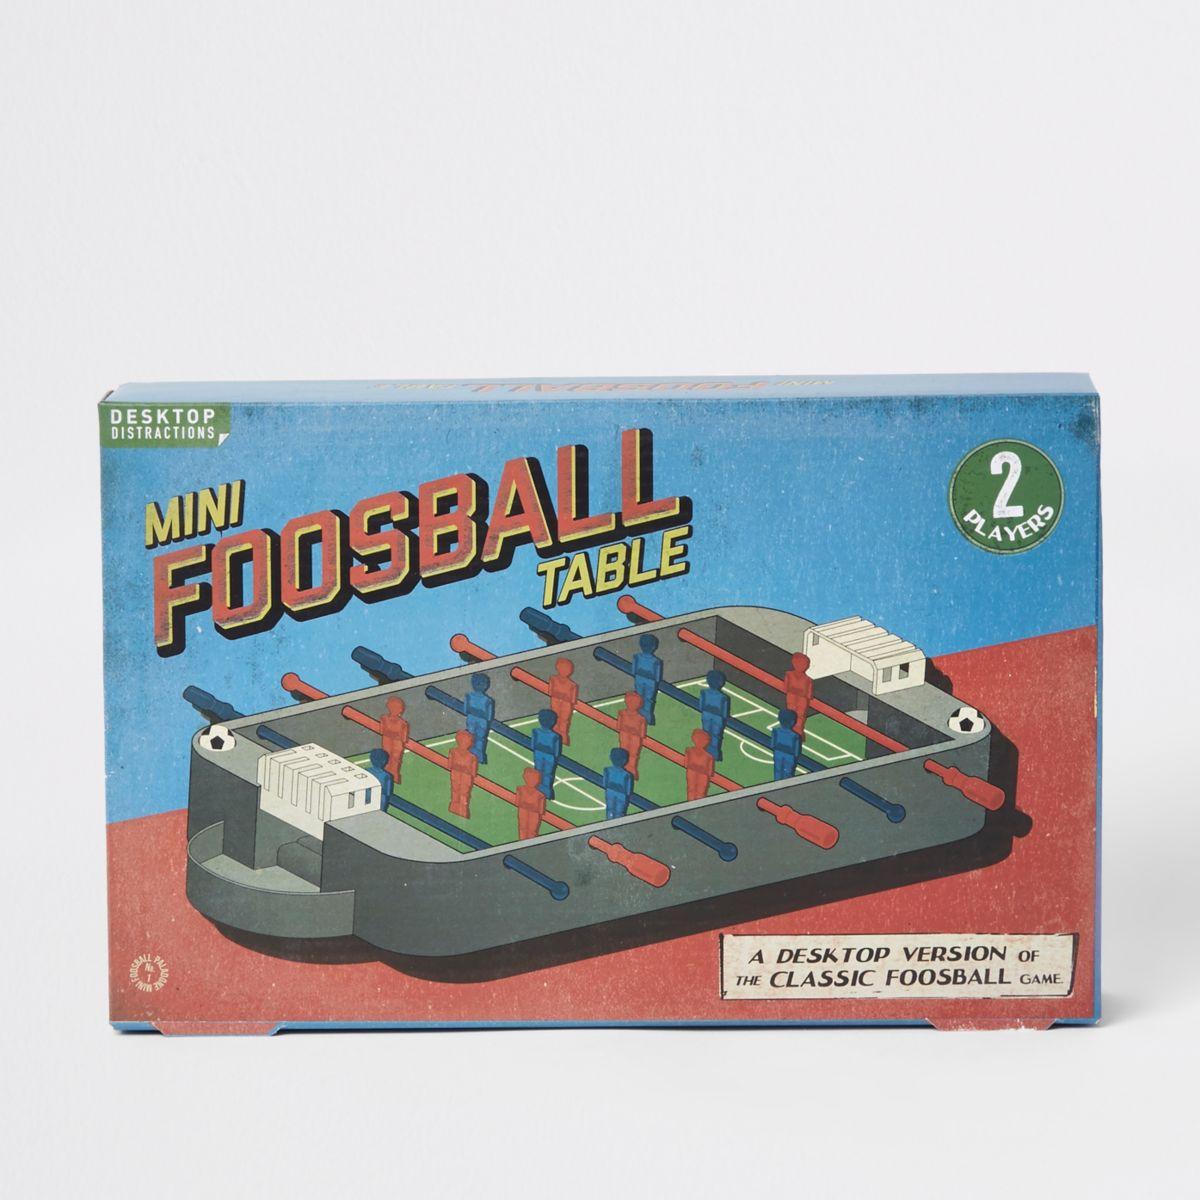 Grey mini foosball table